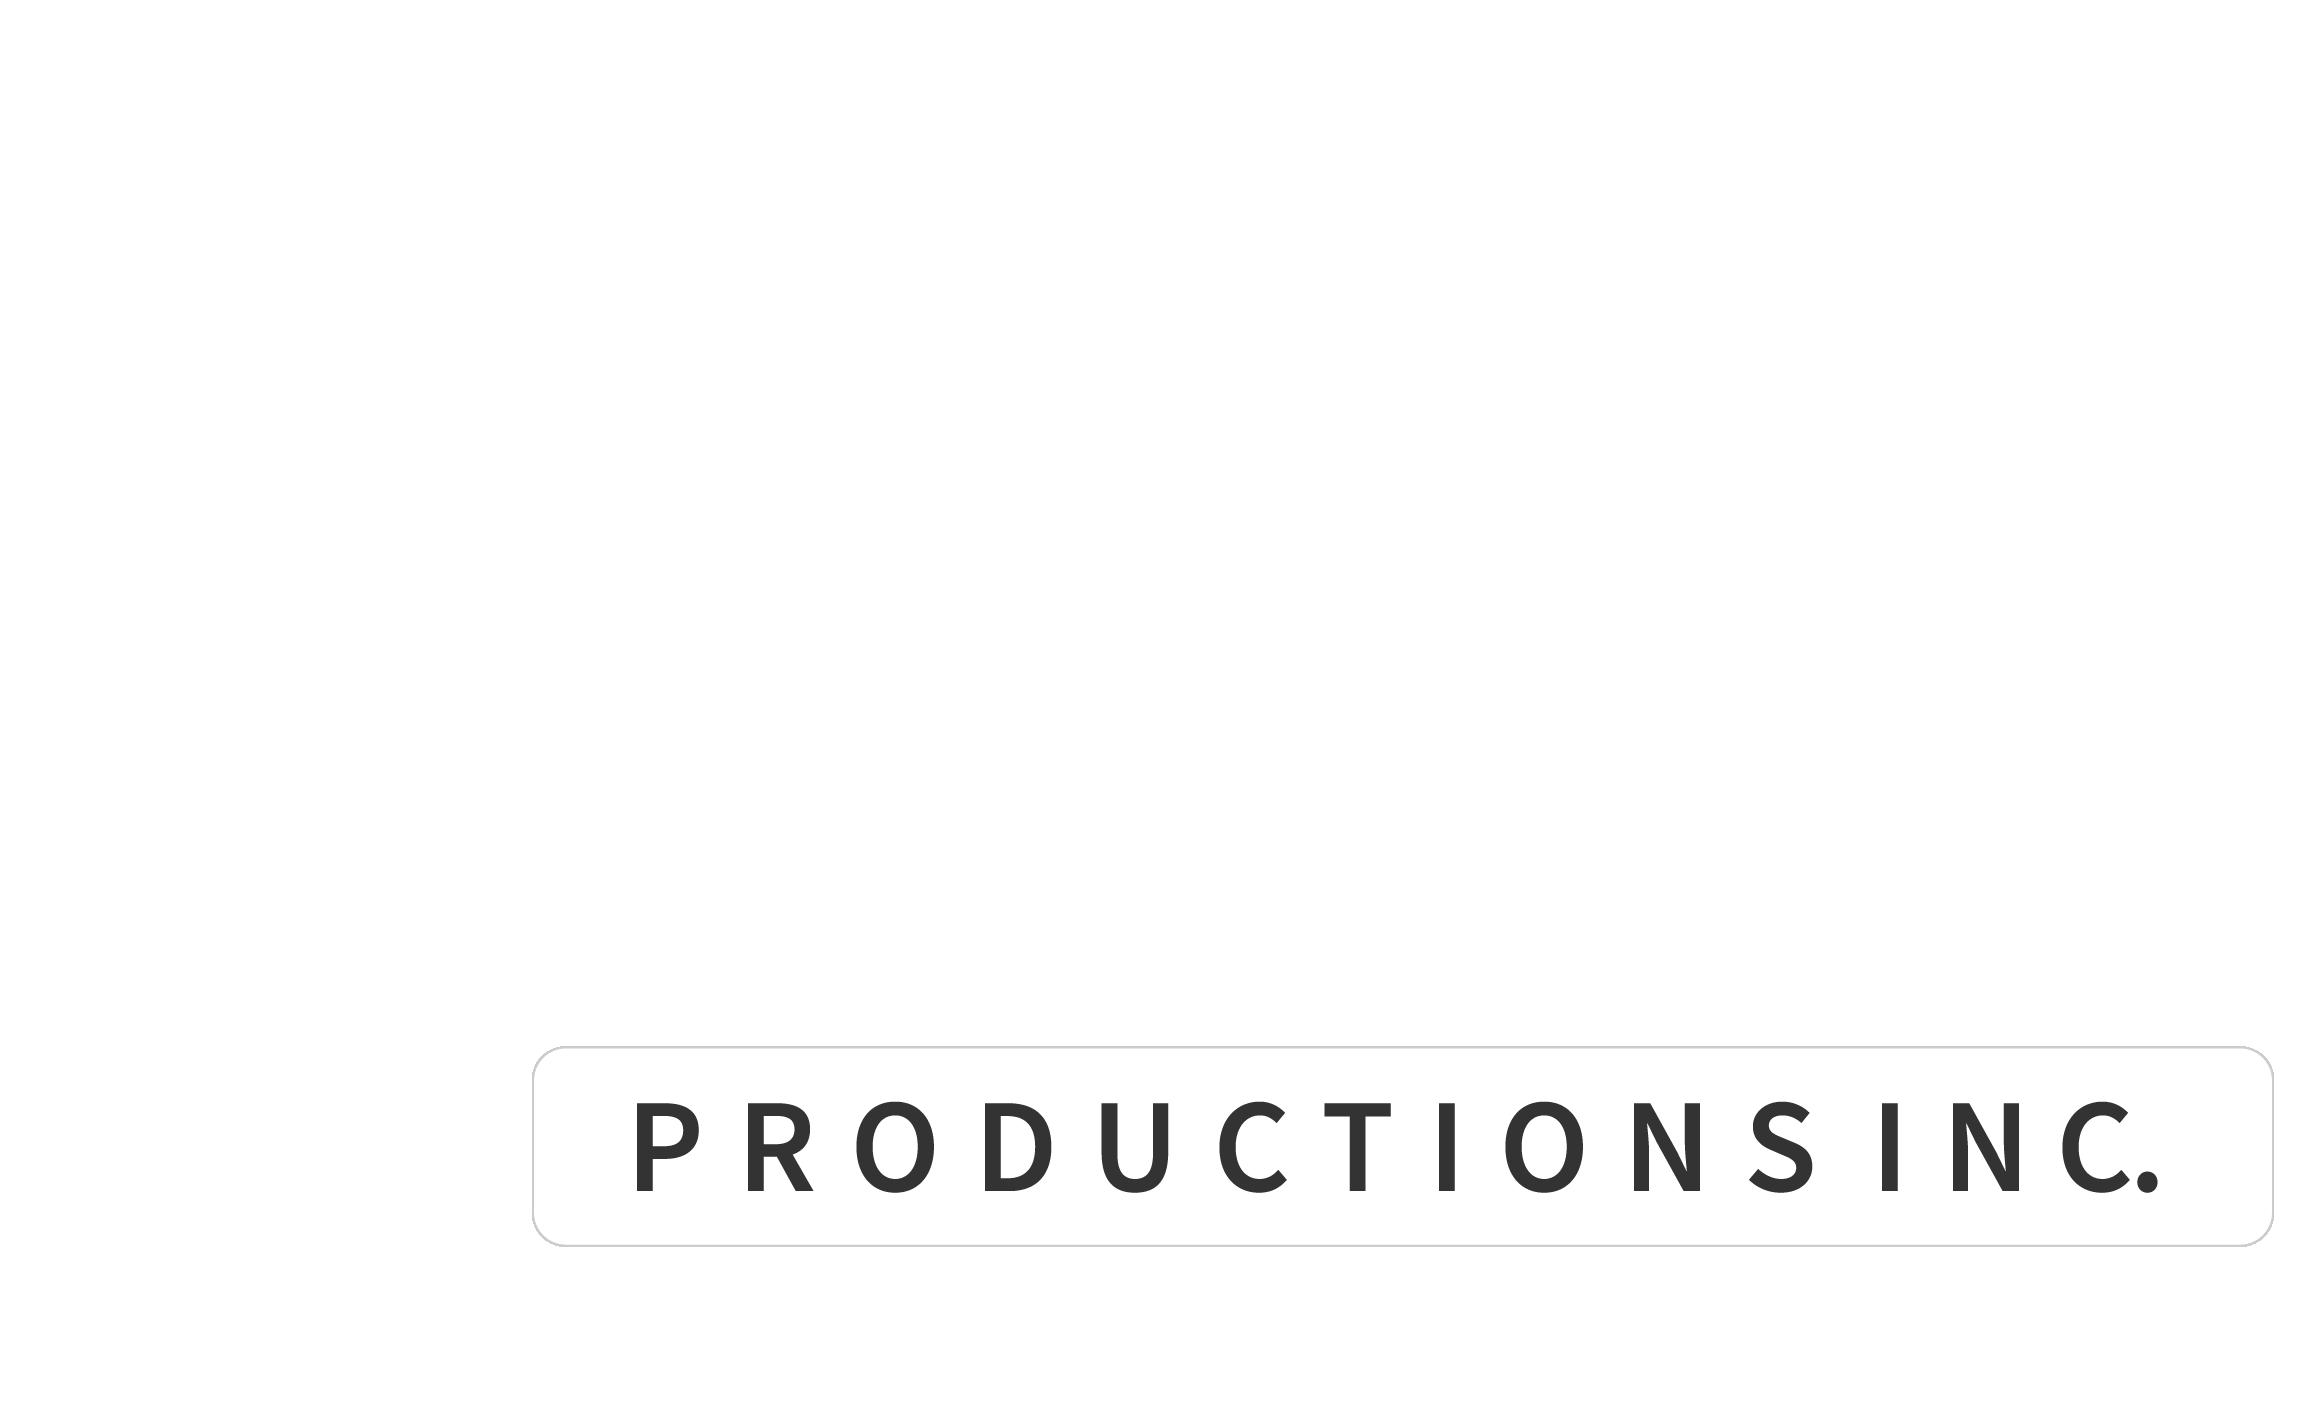 Pyro Productions INC.